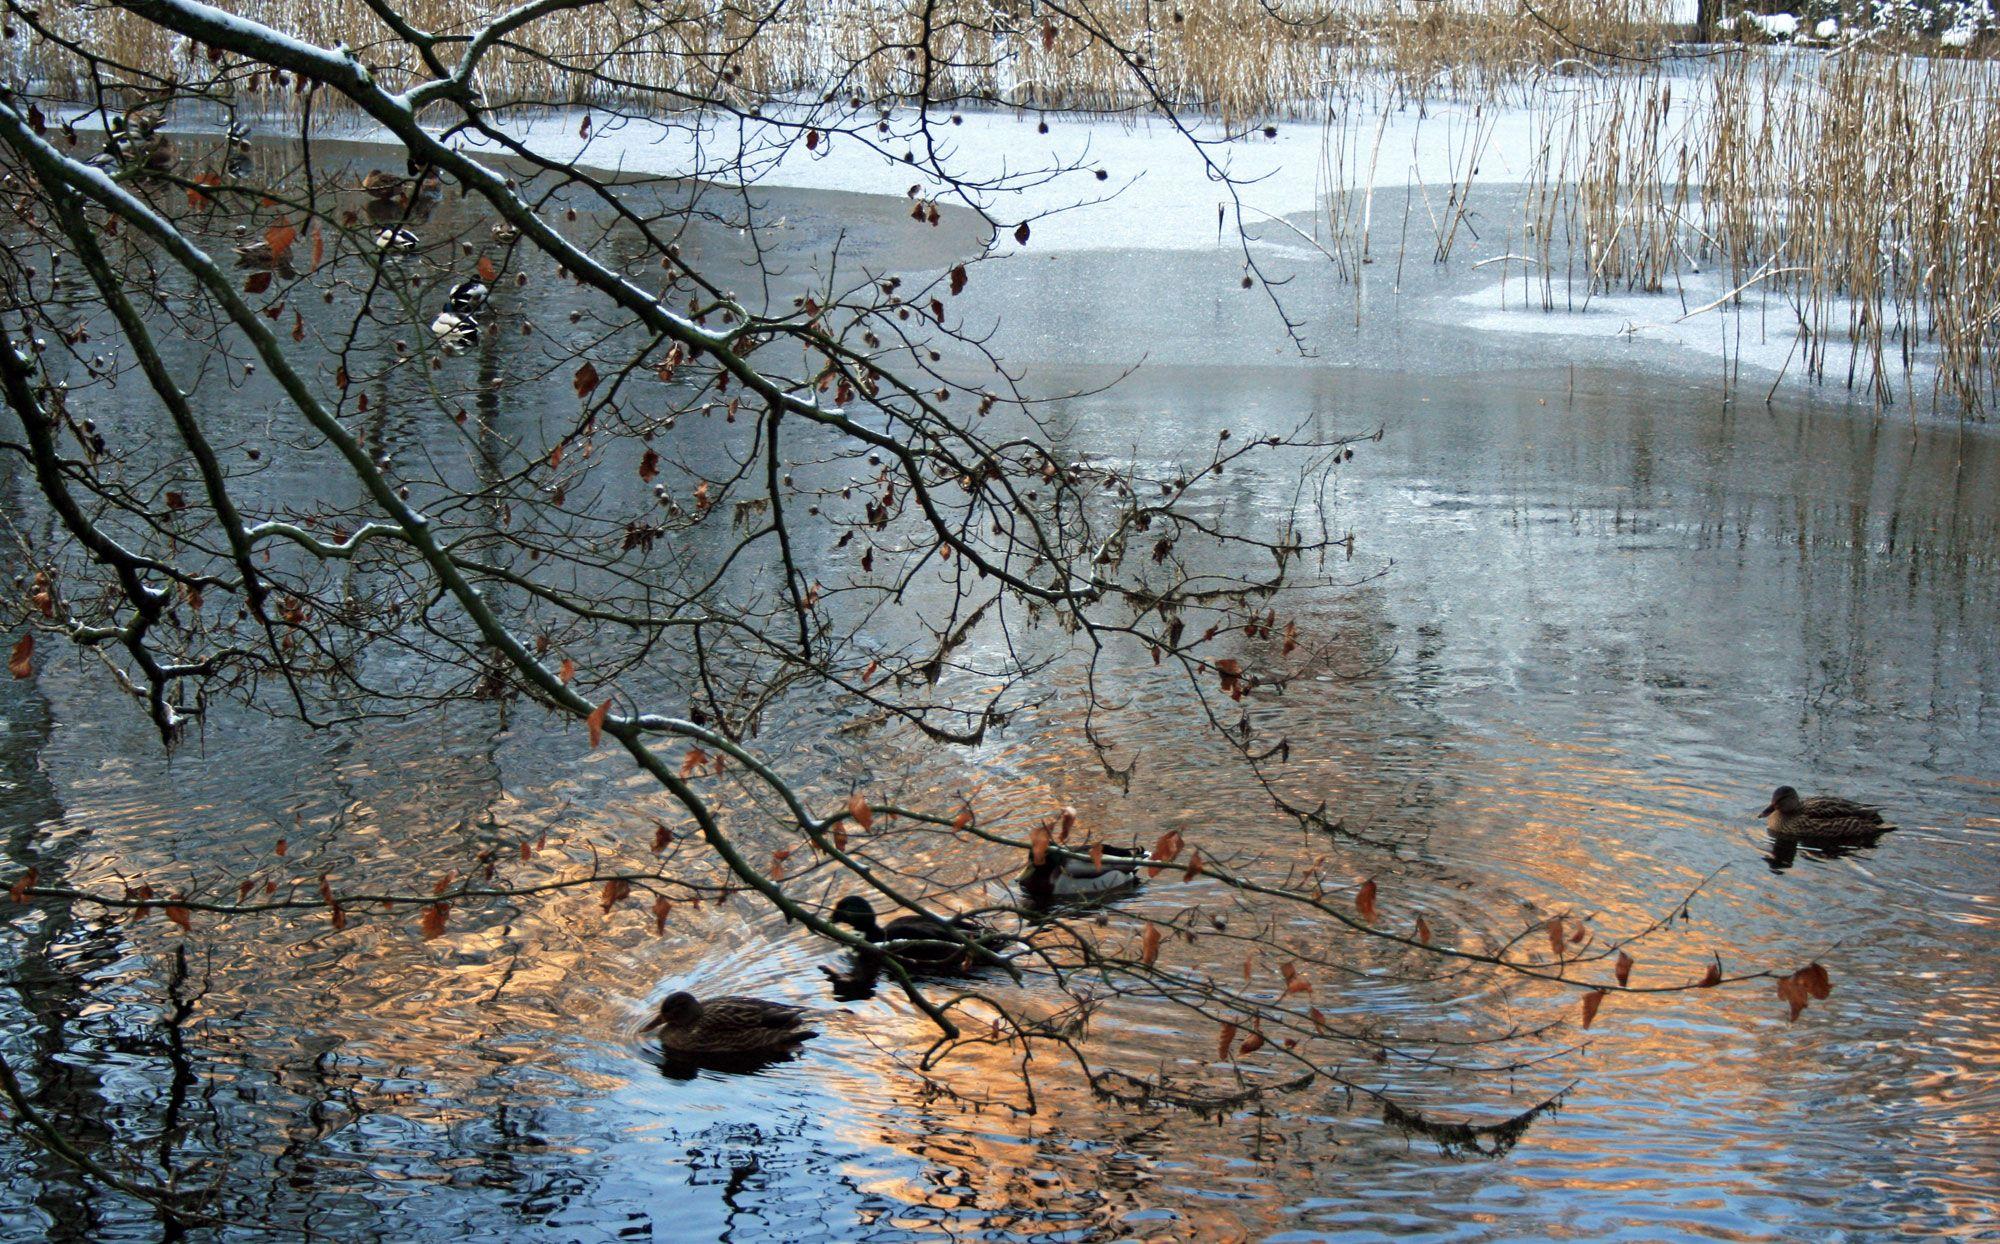 © crucifix marielle #winter#snow#parcsolvay#forêtdesoignes#white#frost#duck#water